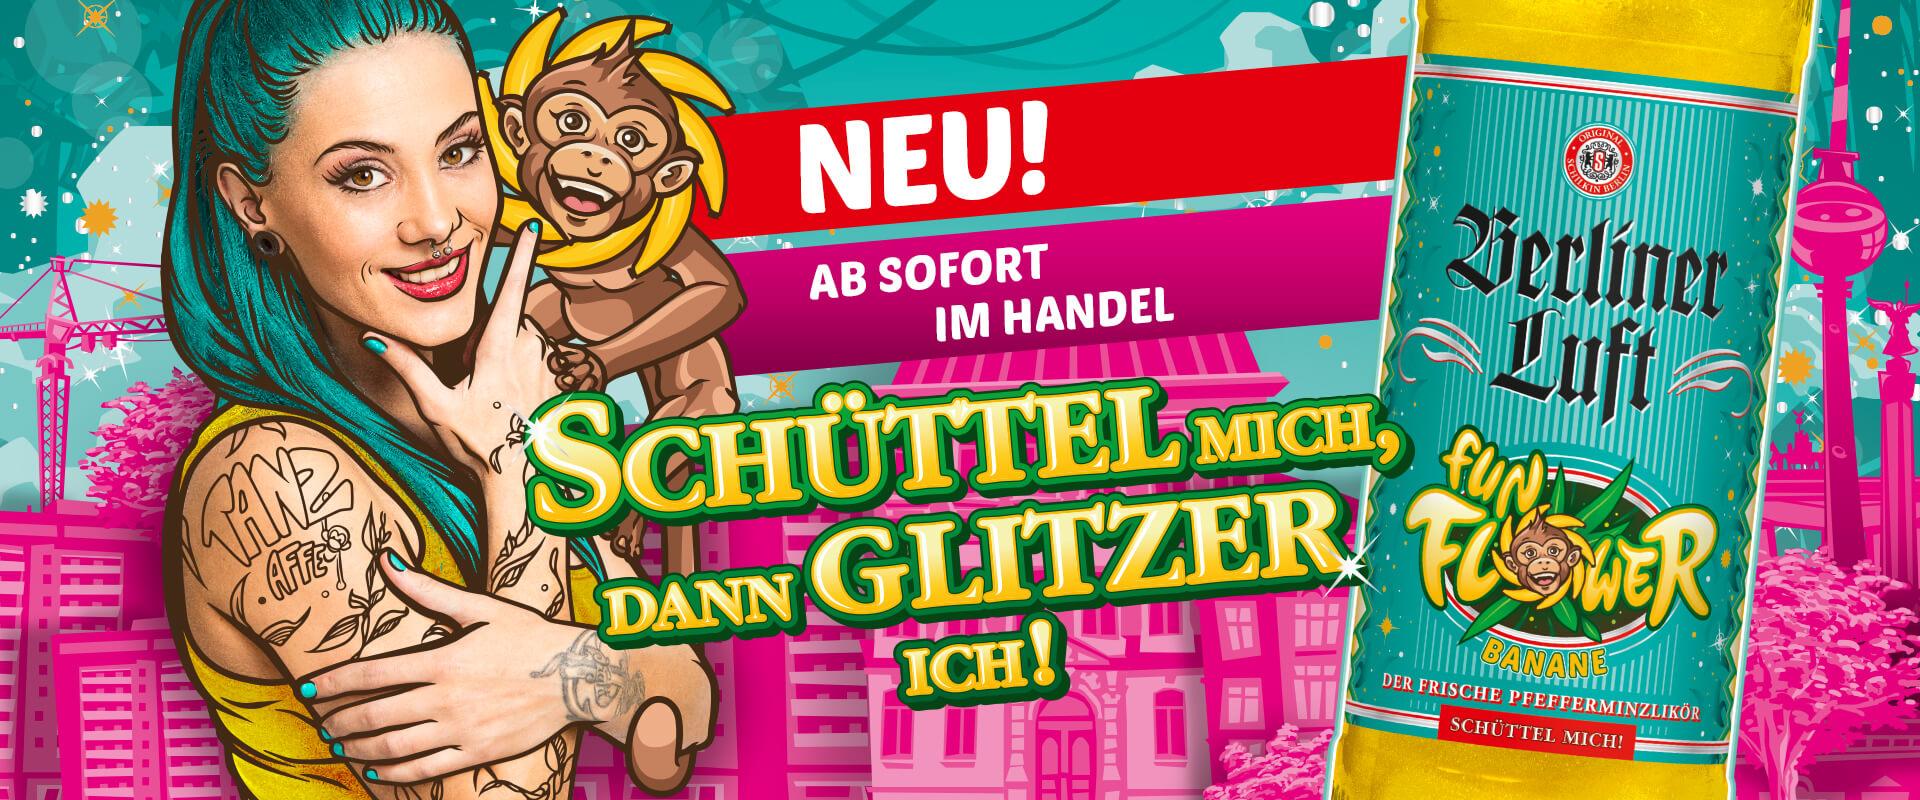 Berliner Luft Kooperation mit Overkill: Berliner Luft Schuh